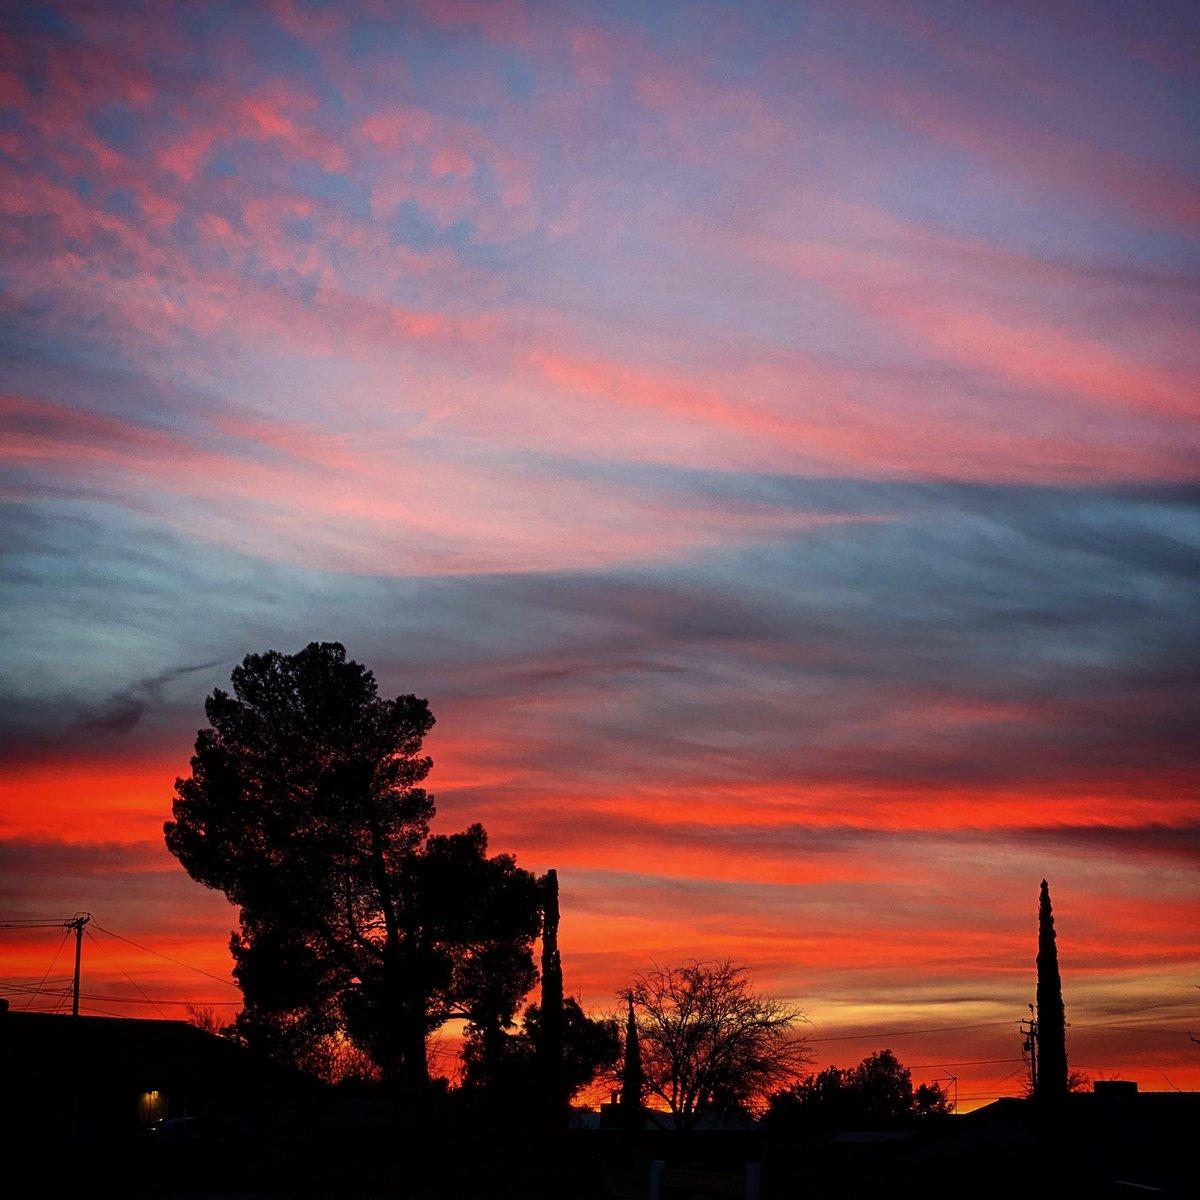 #photo #desertskies #desert #sky #photography #iphone #shotoniphone #shotoniphone11promax #photooftheday #naturephotography #photographer #photograph #power #landscape #sunrise #sunset #tree #clouds #stars #moon #colorful #nature #rainbow #mountains #horizon #pigpaint